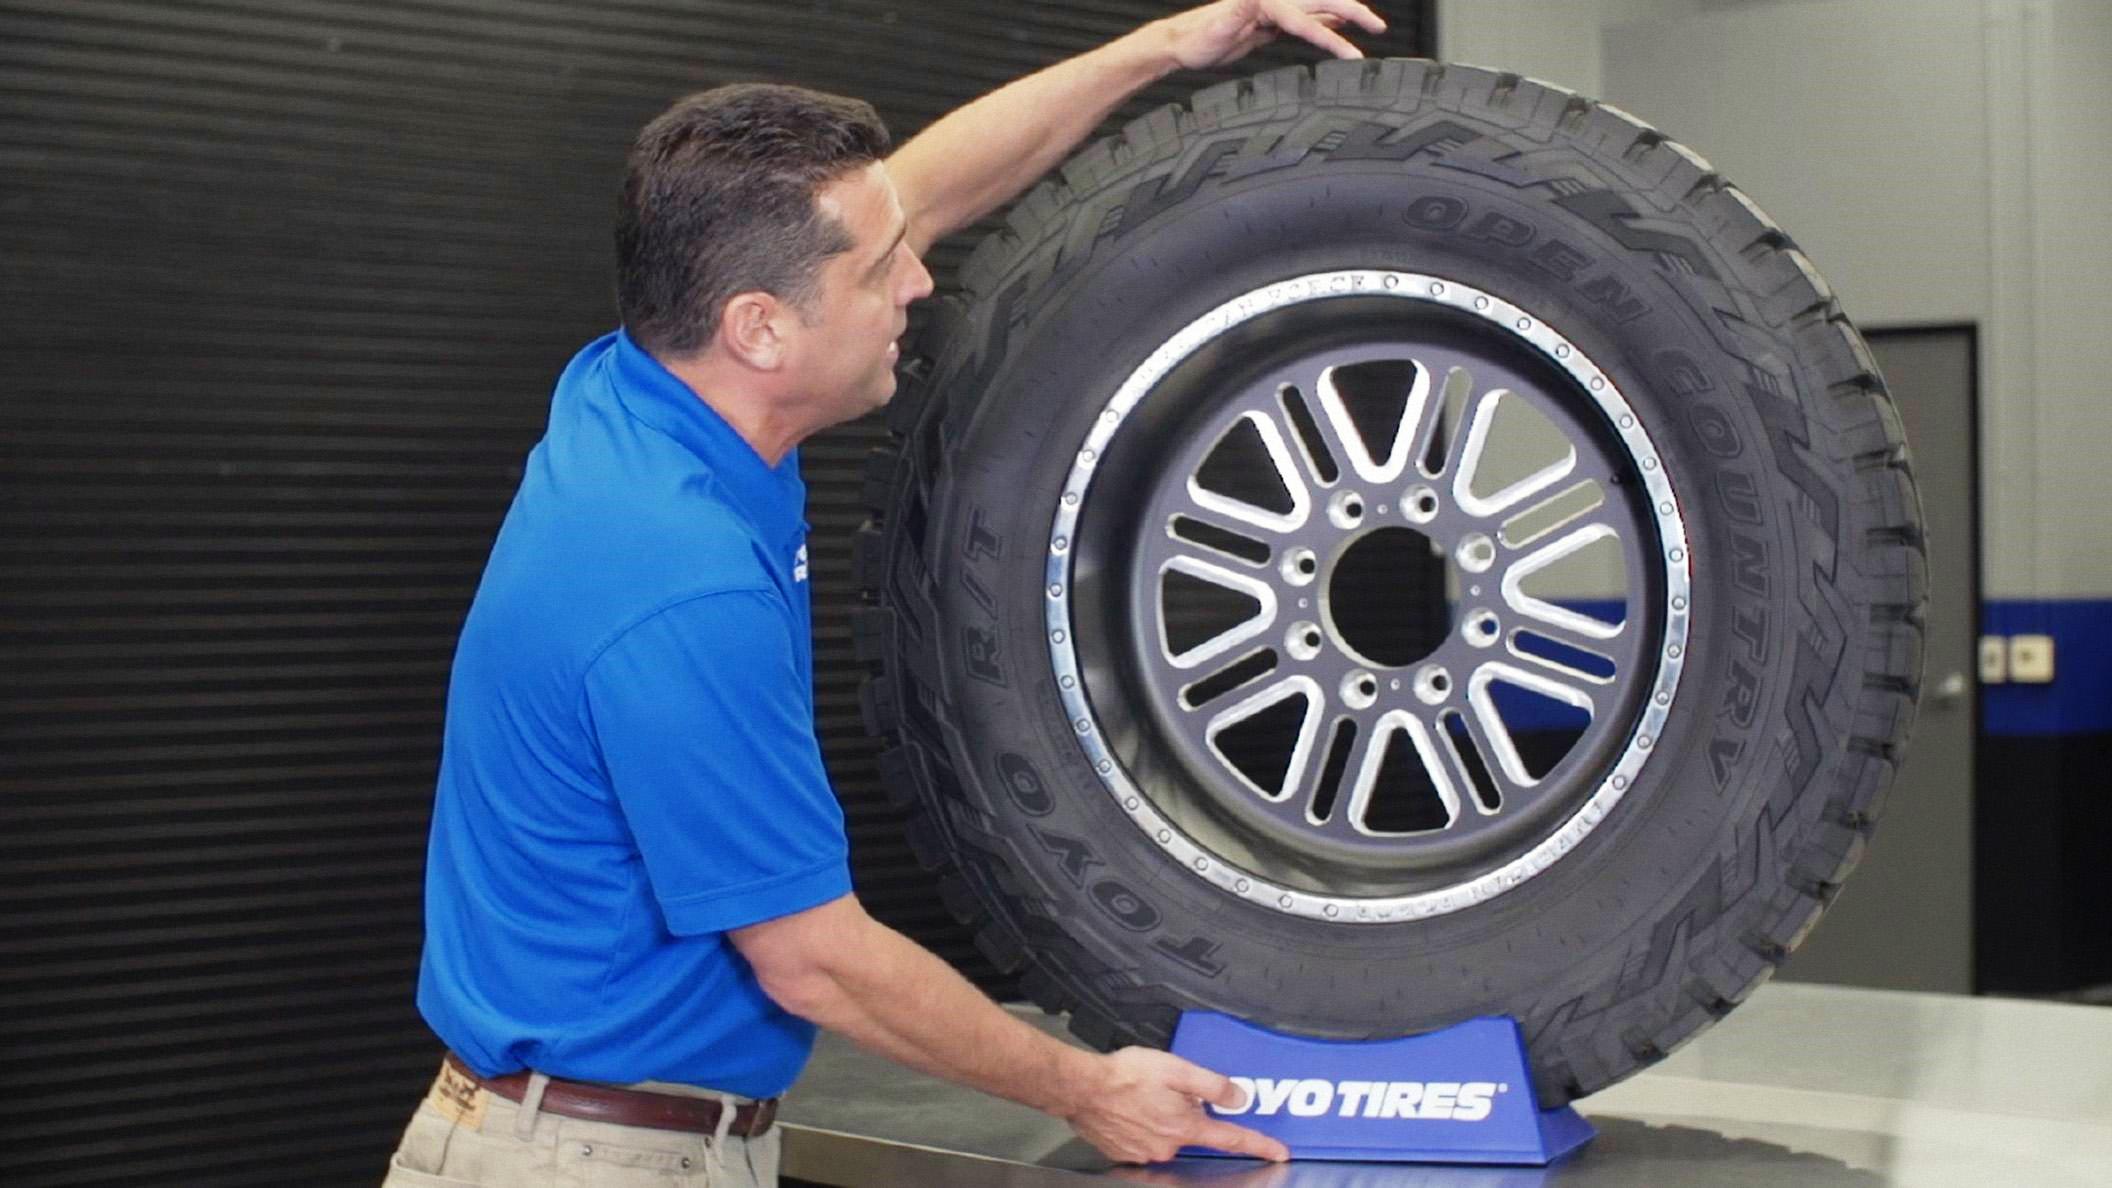 Toyo Tires celebrates National Tire Safety Week